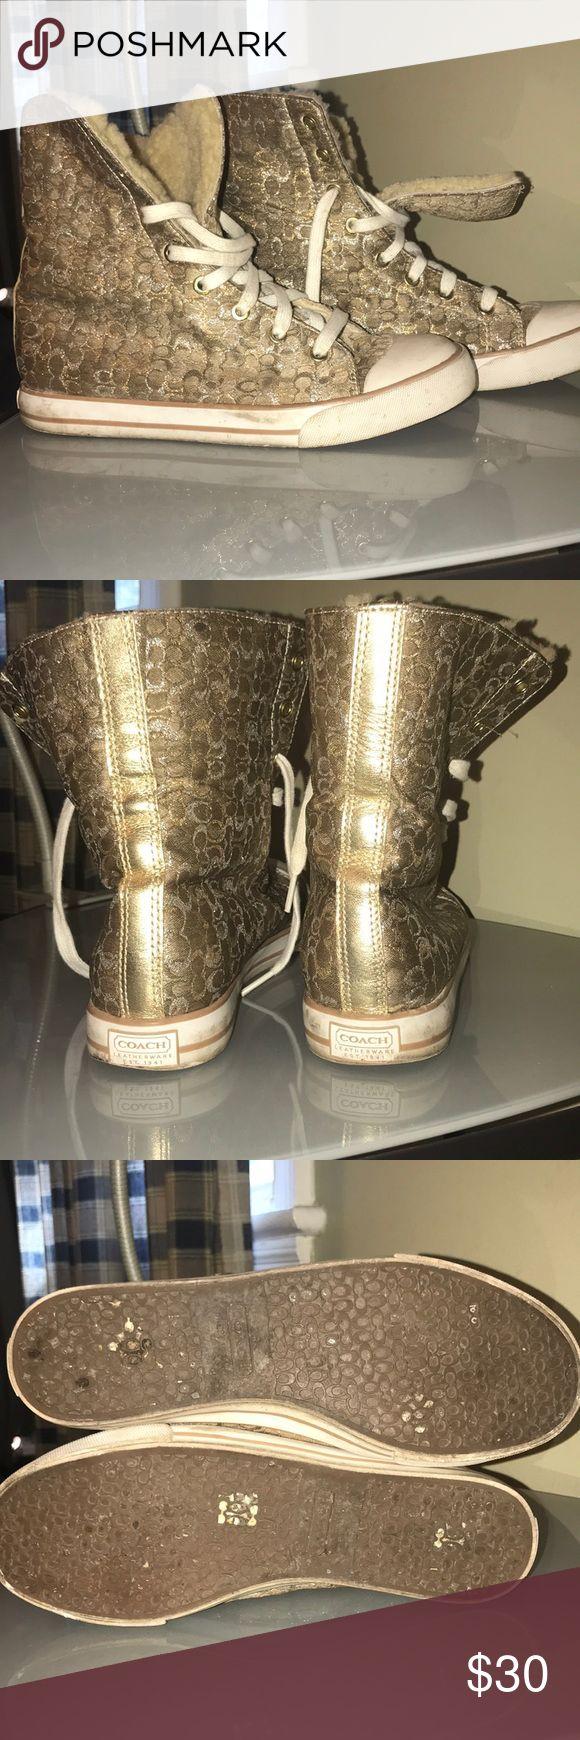 Gold COACH Tennis Shoes Very cute metallic gold and silver COACH Bonney shearling high top tennis shoe Coach Shoes Athletic Shoes